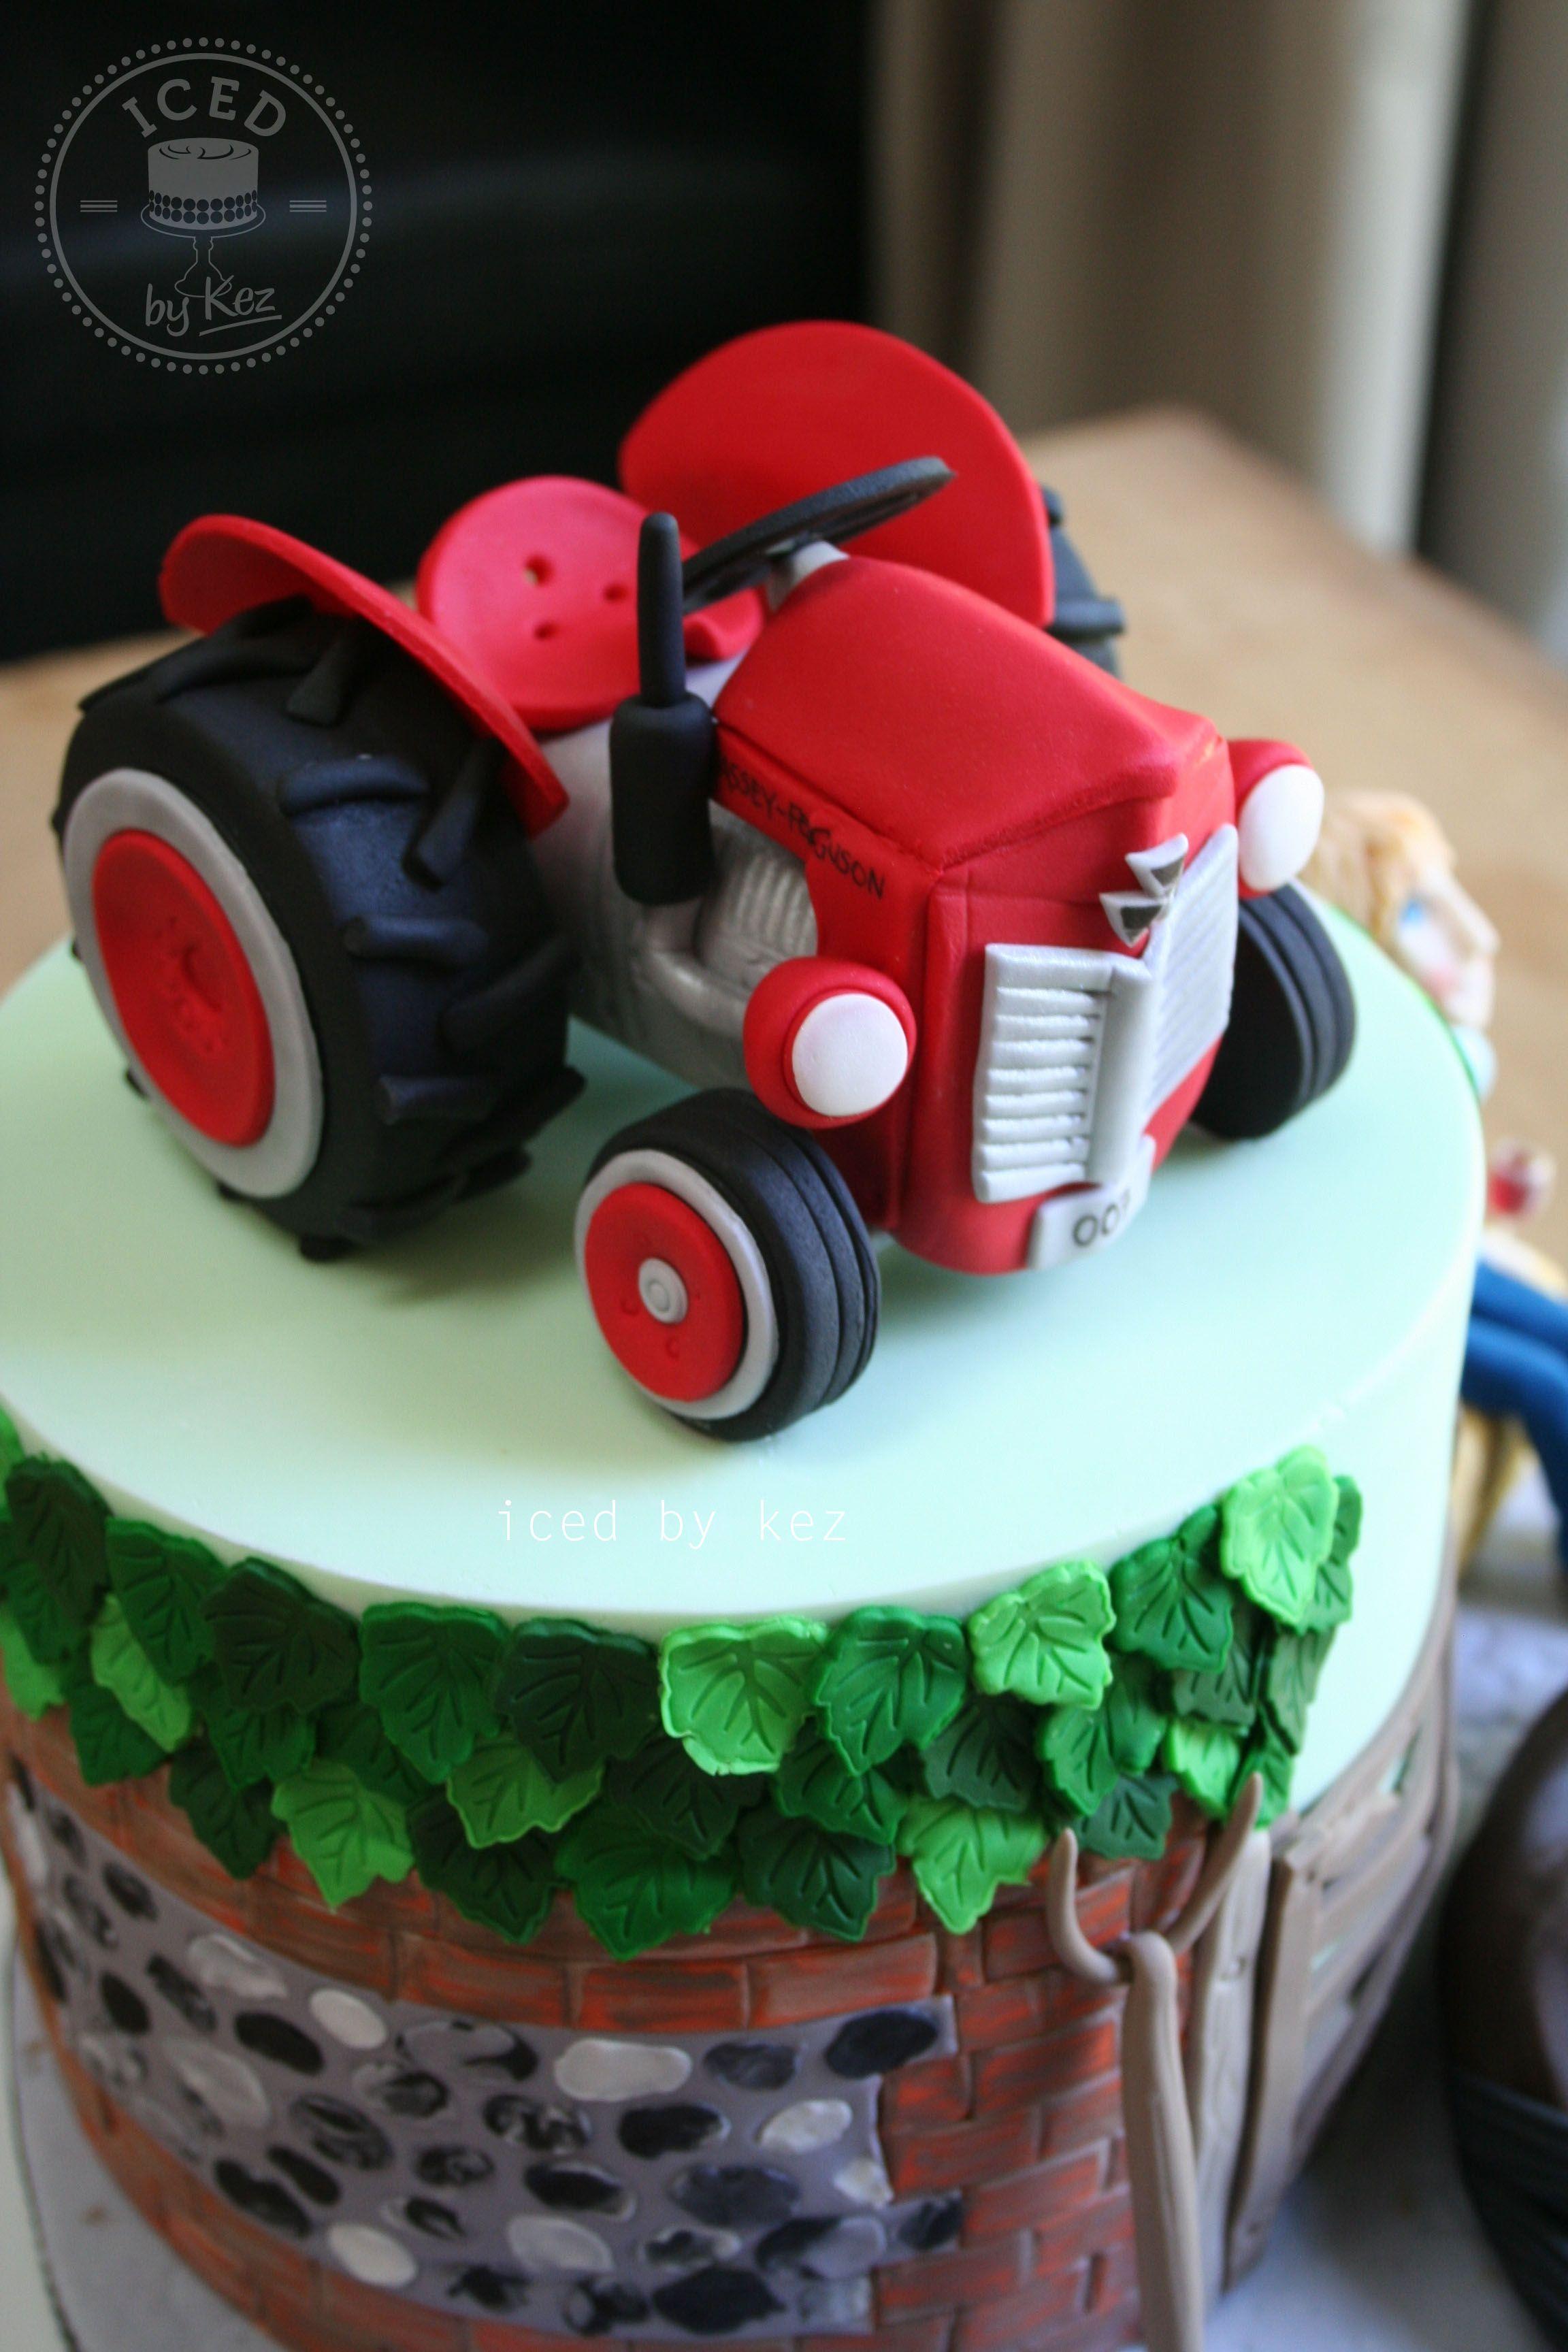 Massey Fergusson Tractor Cake Topper Kez X